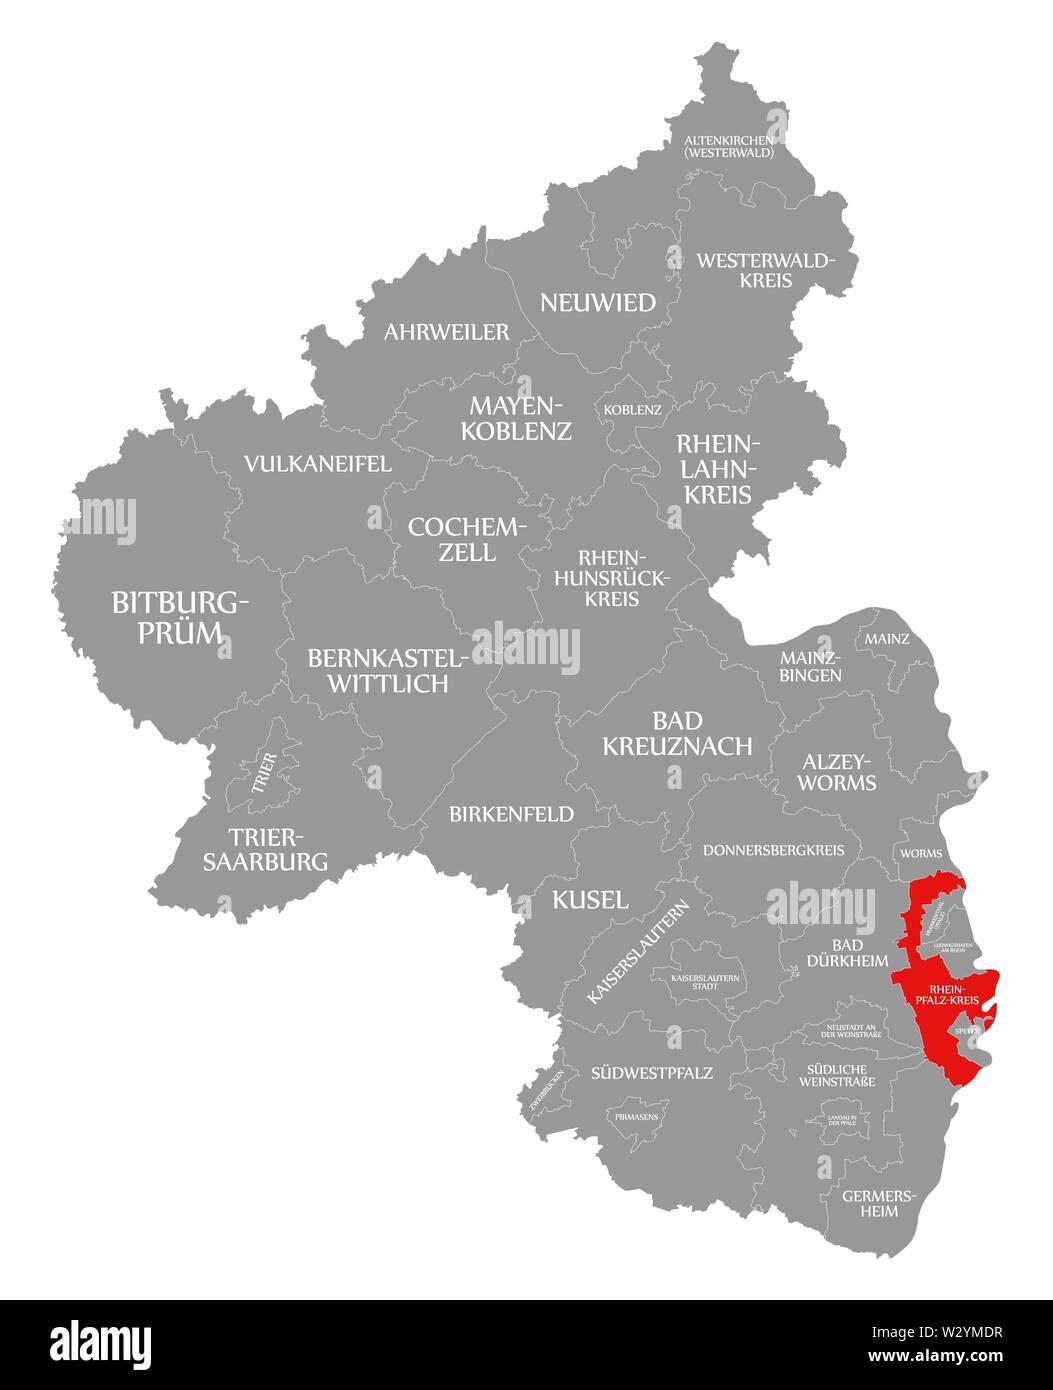 Rhein Pfalz Kreis red highlighted in map of Rhineland Palatinate DE - Stock Image